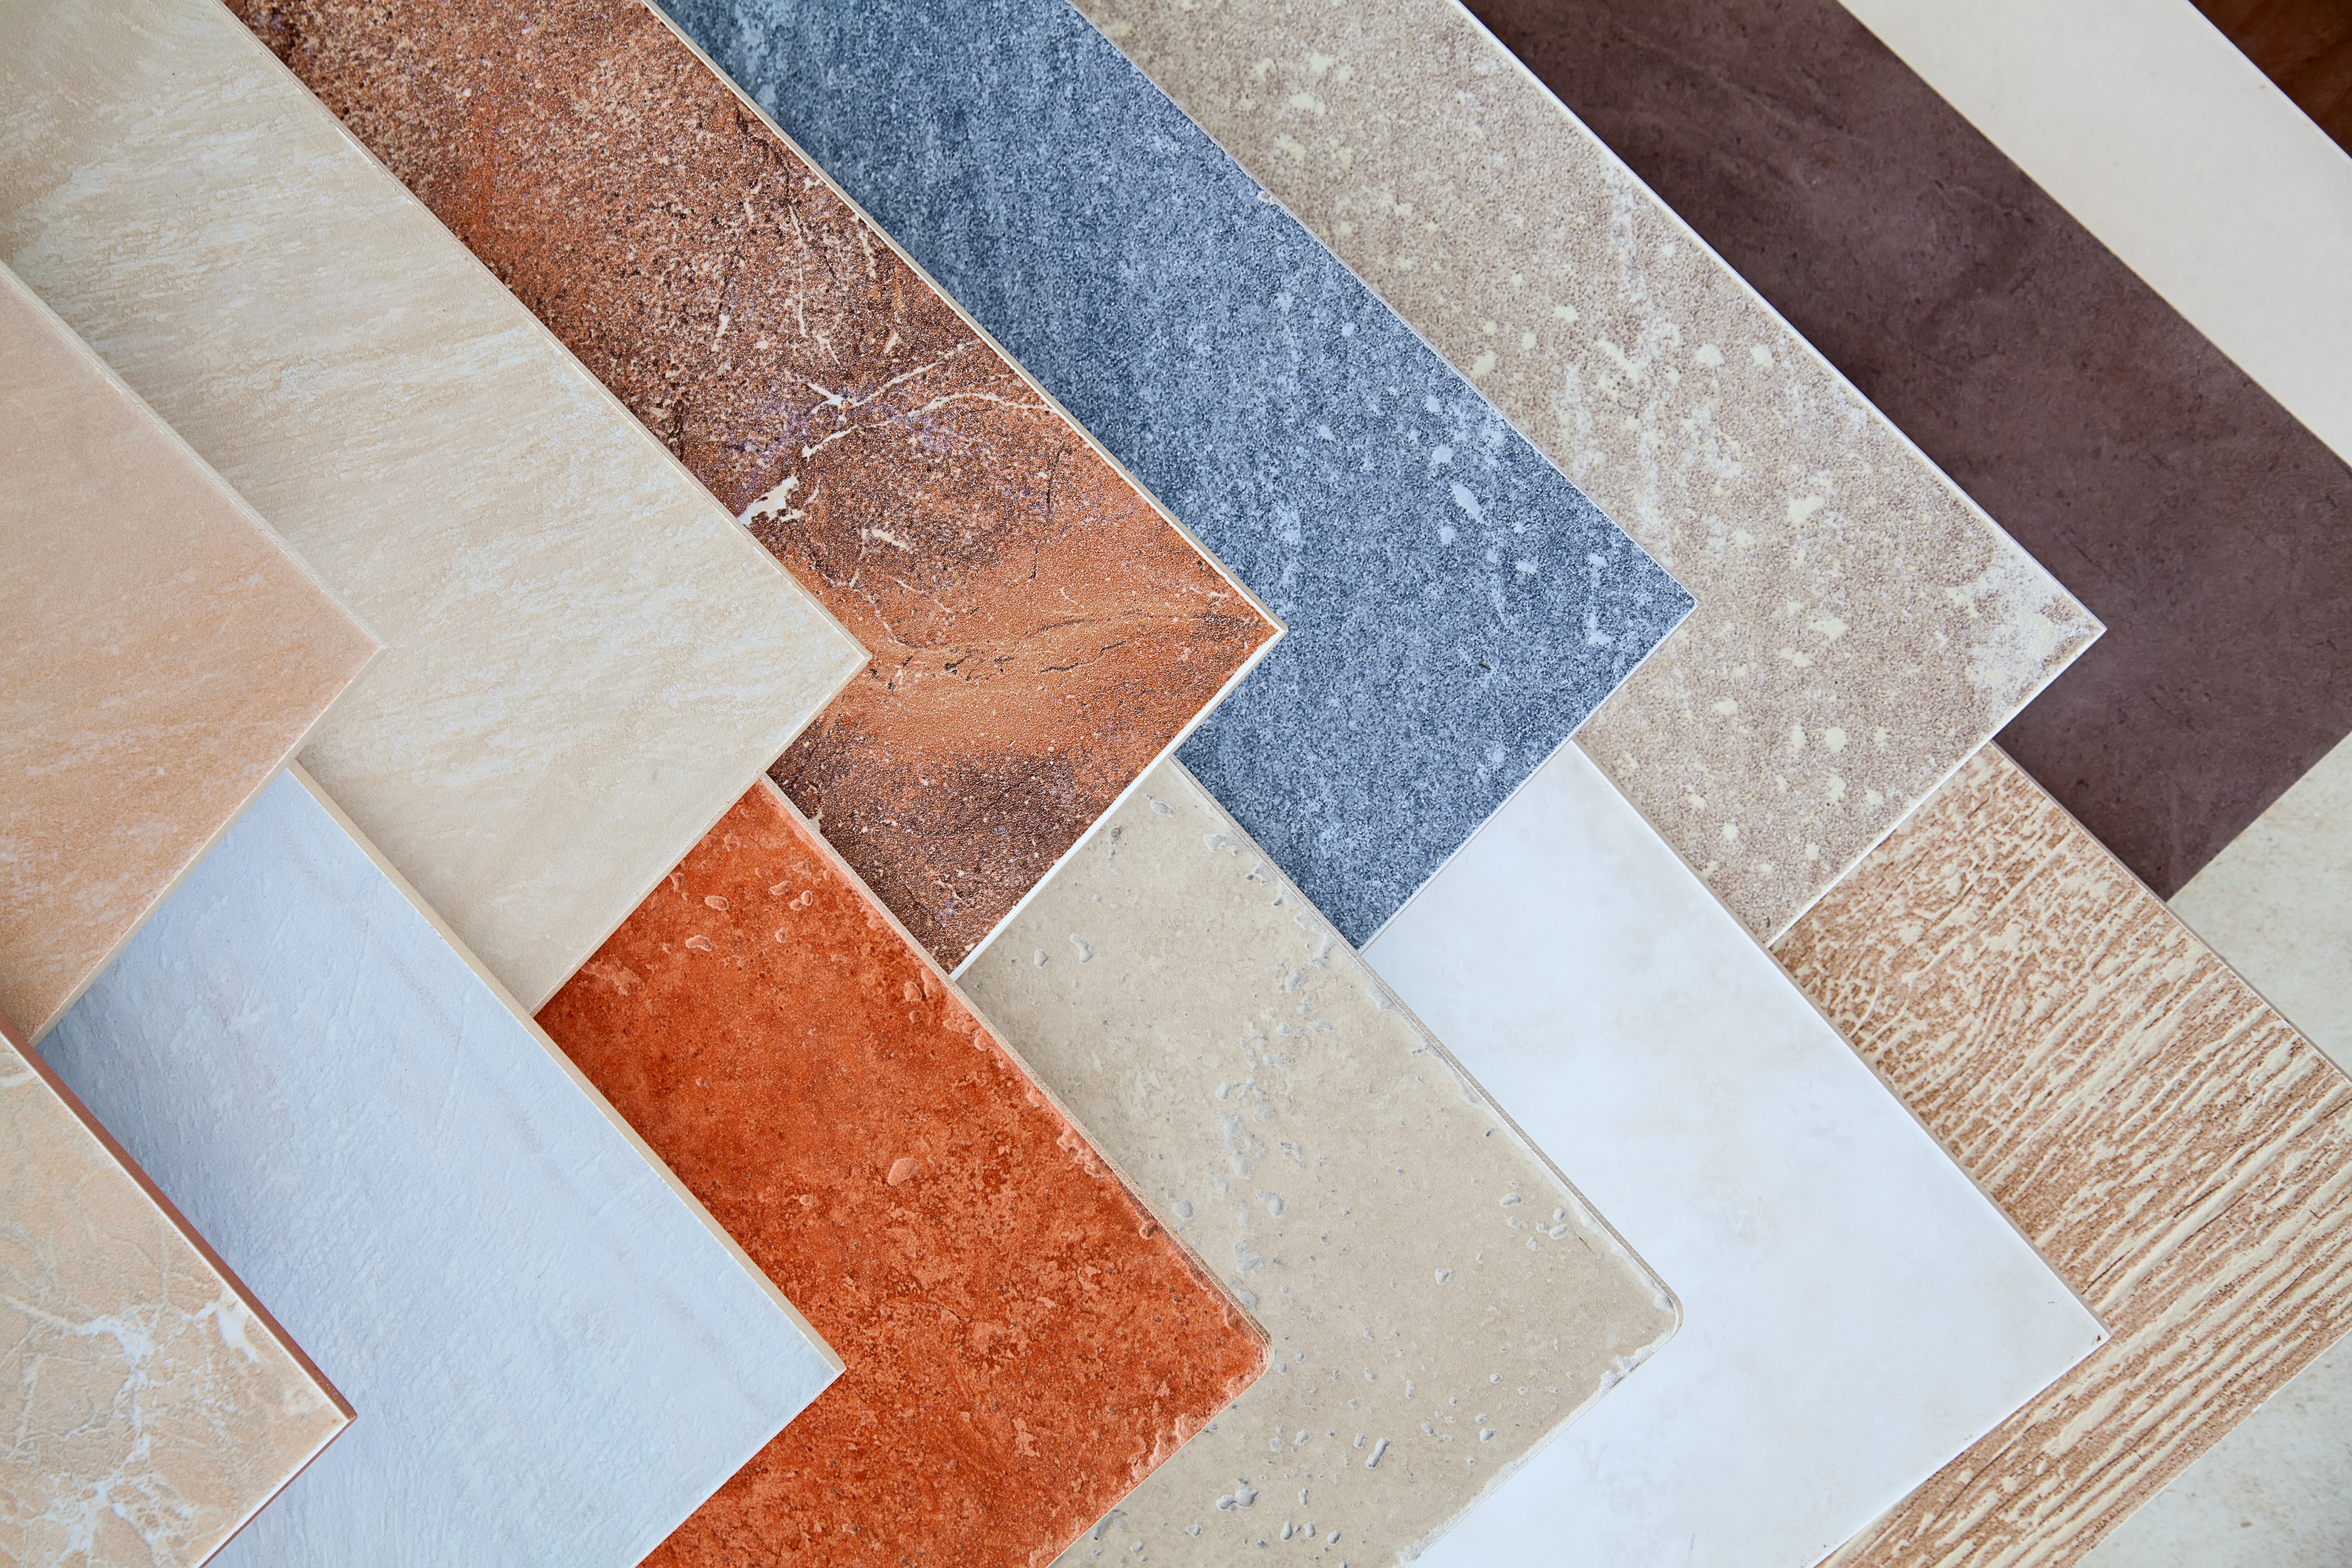 ceramic tile shutterstock_135668507 INGMAWY